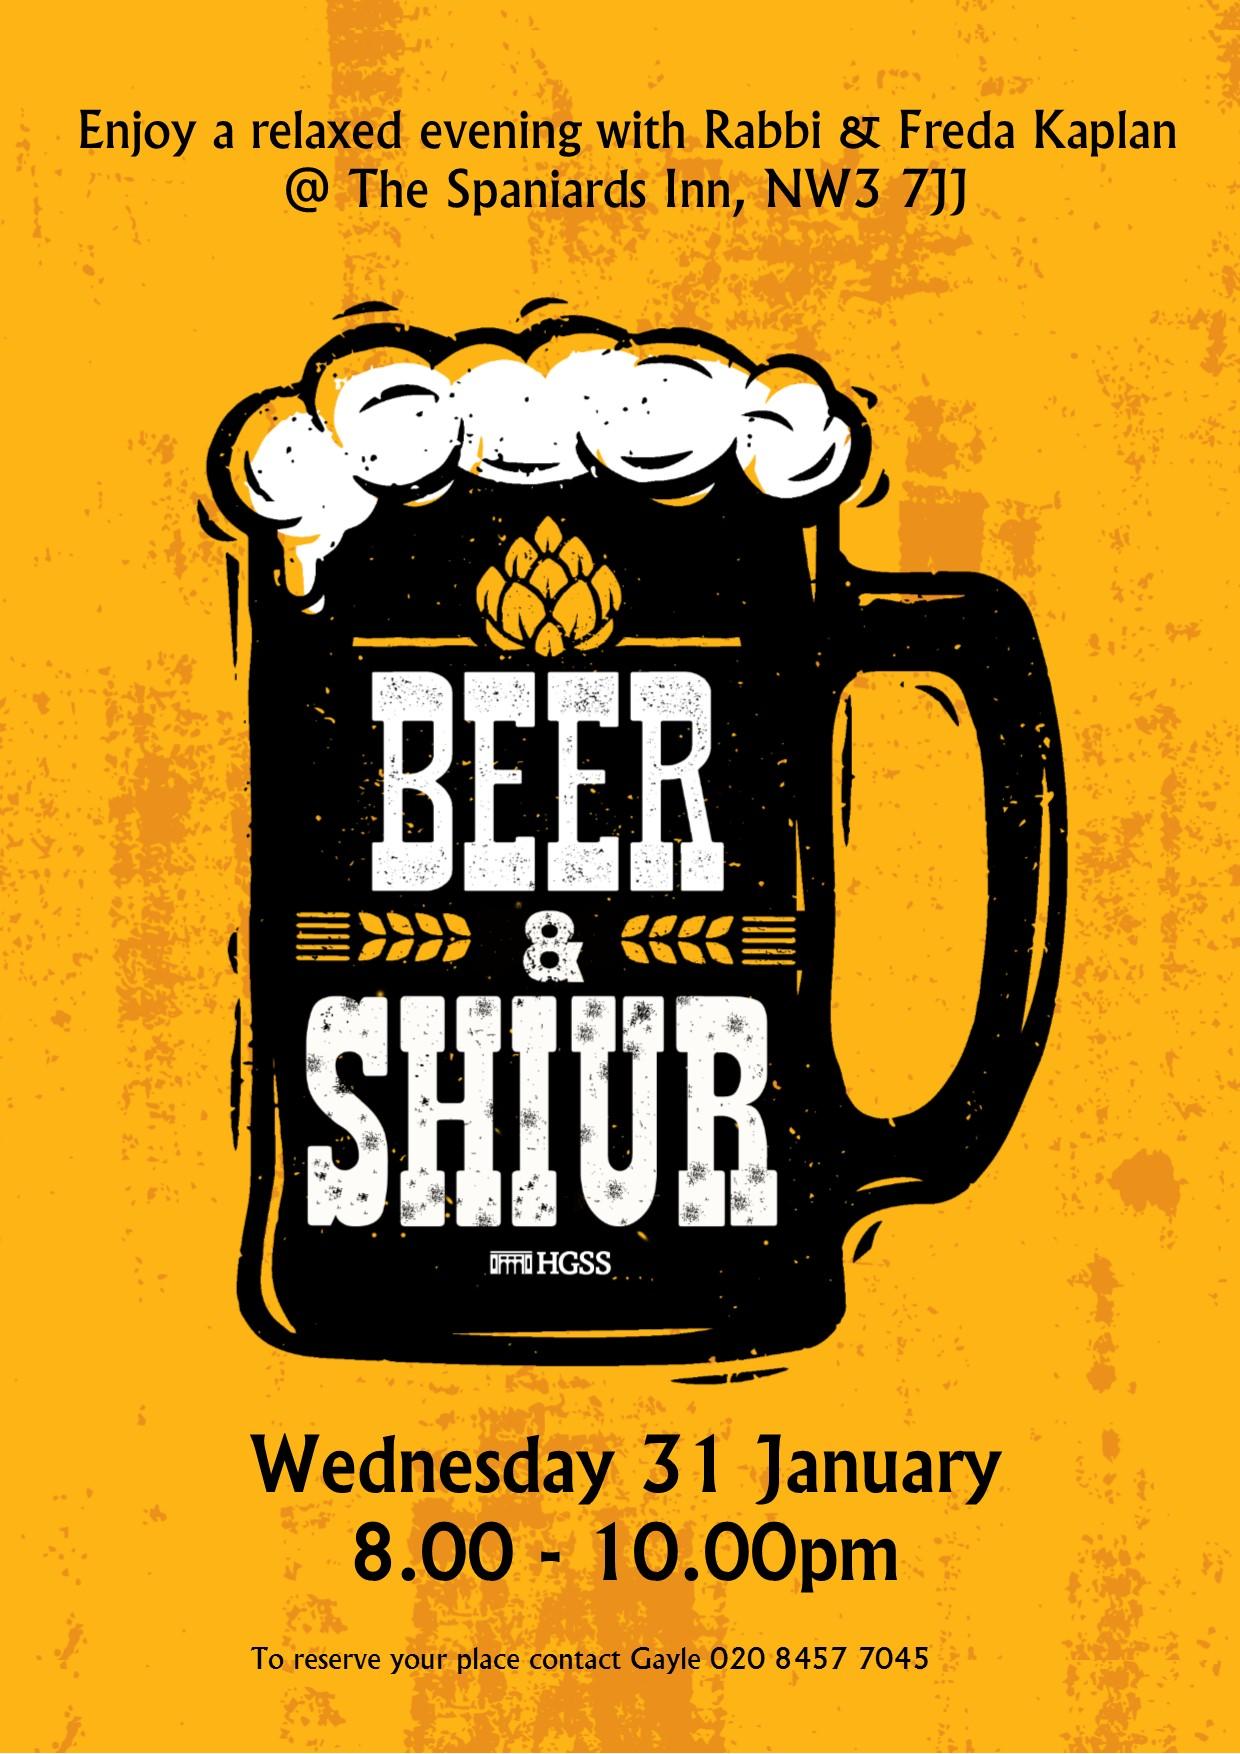 Beer & Shiur @ The Spaniards Inn, NW3 7JJ